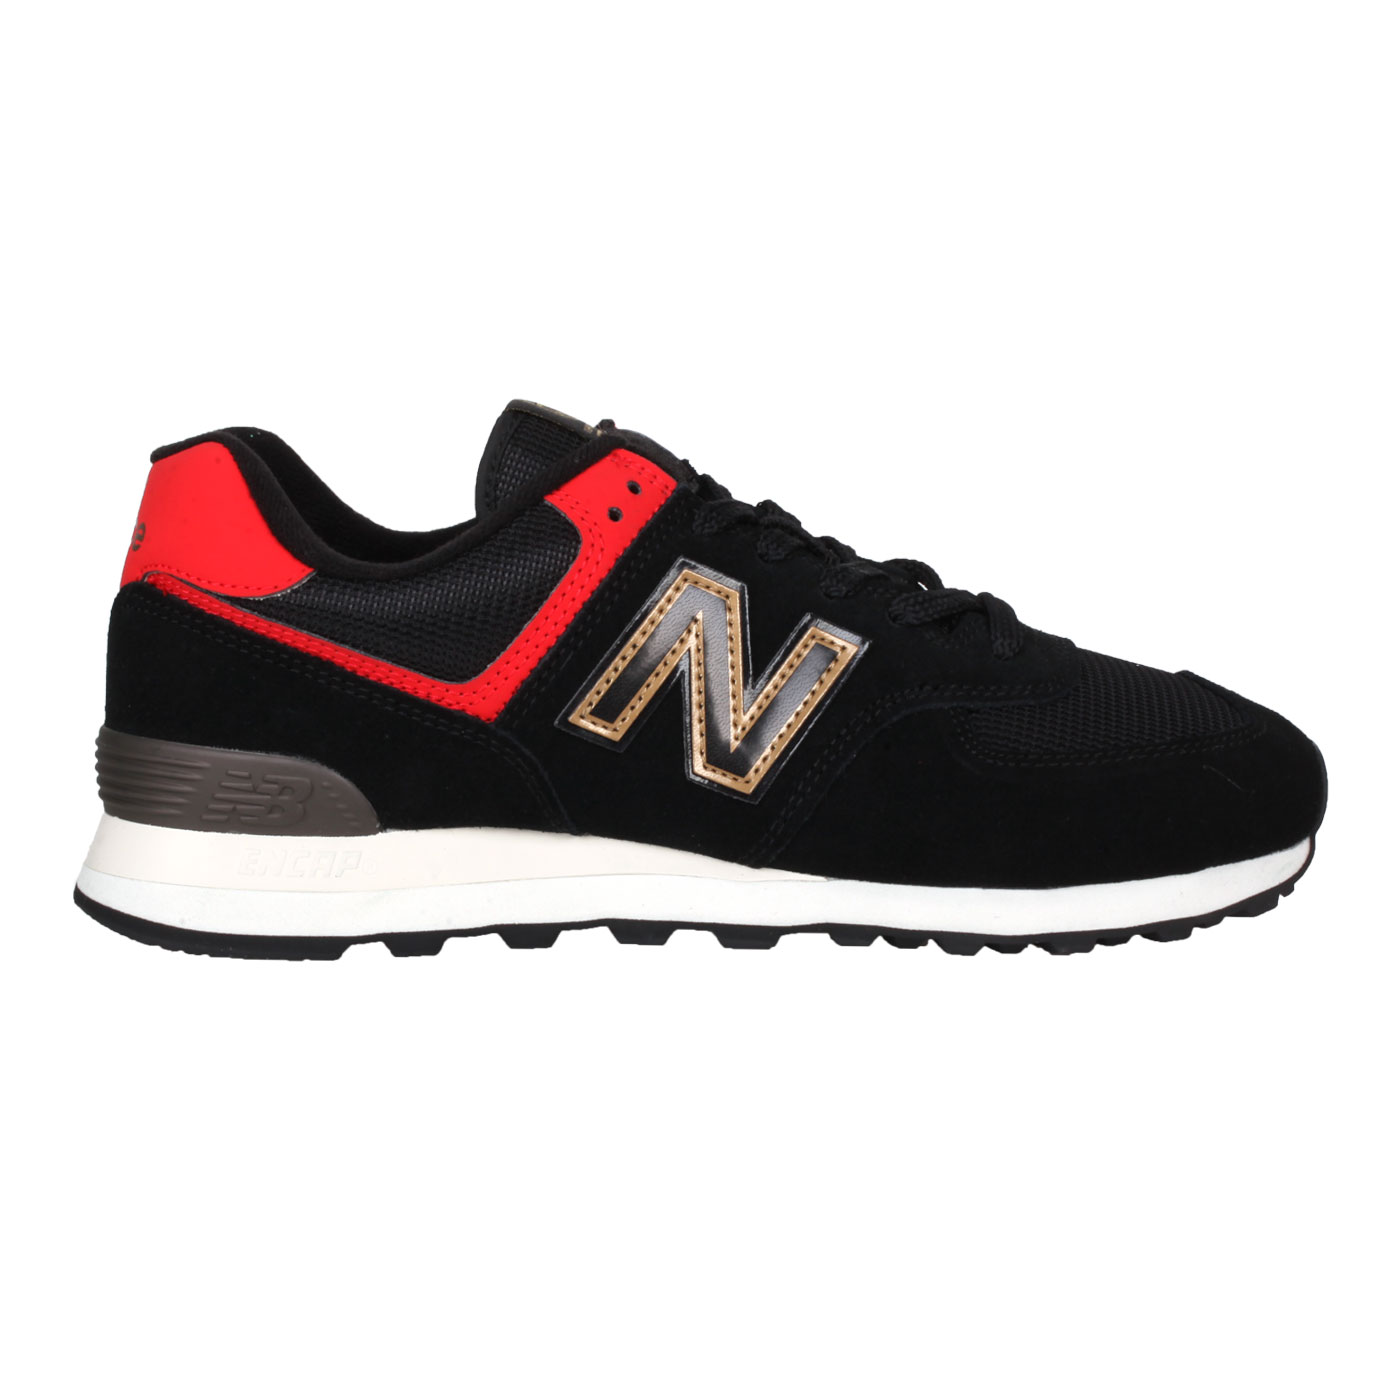 NEW BALANCE 男款休閒鞋 ML574OX3 - 黑棕紅